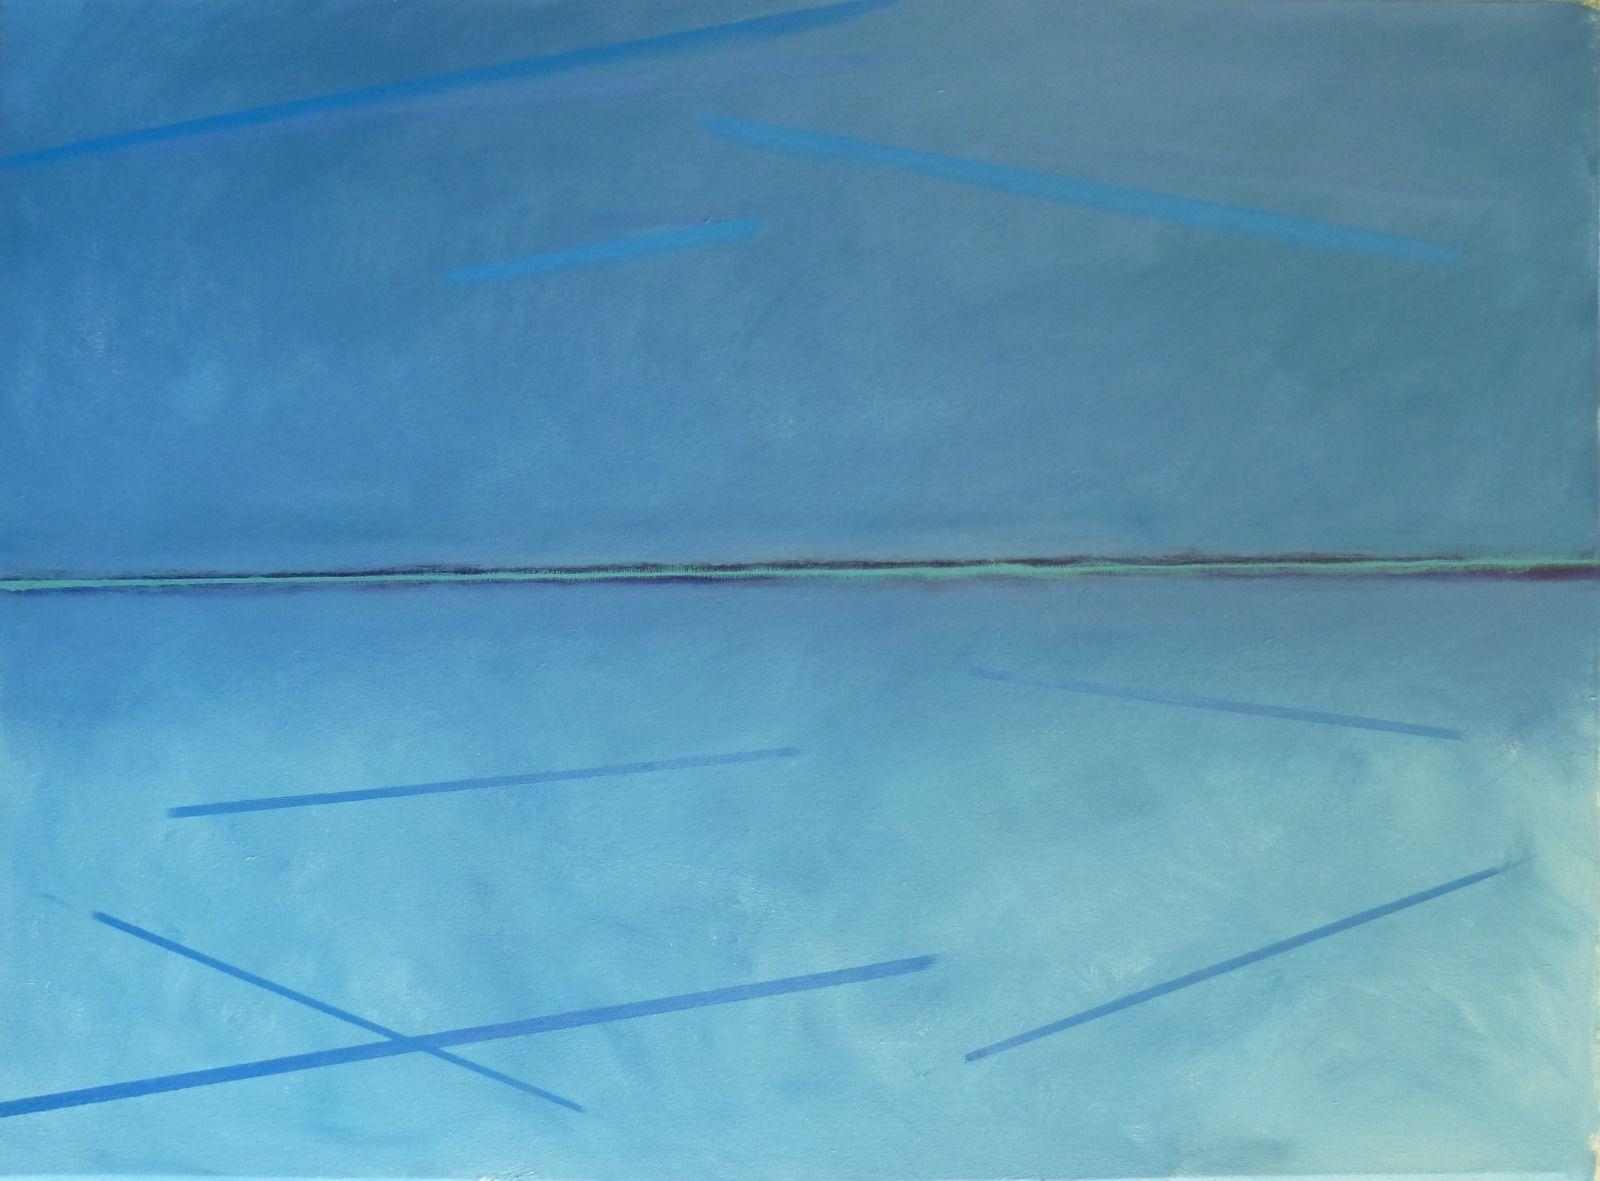 Continuum 5. 69x94cm (oil on canvas)